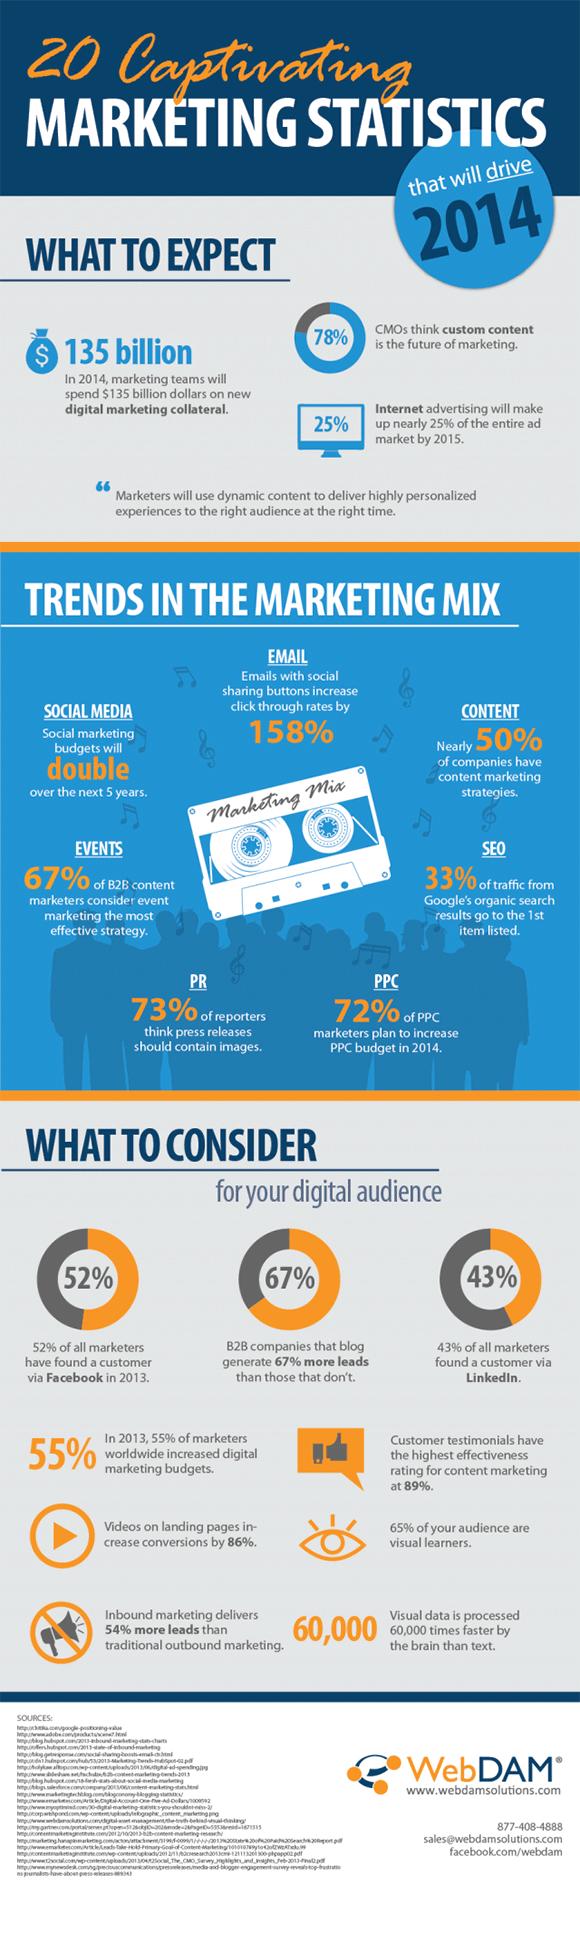 20-Captivating-Marketing-Statistics-Infographic